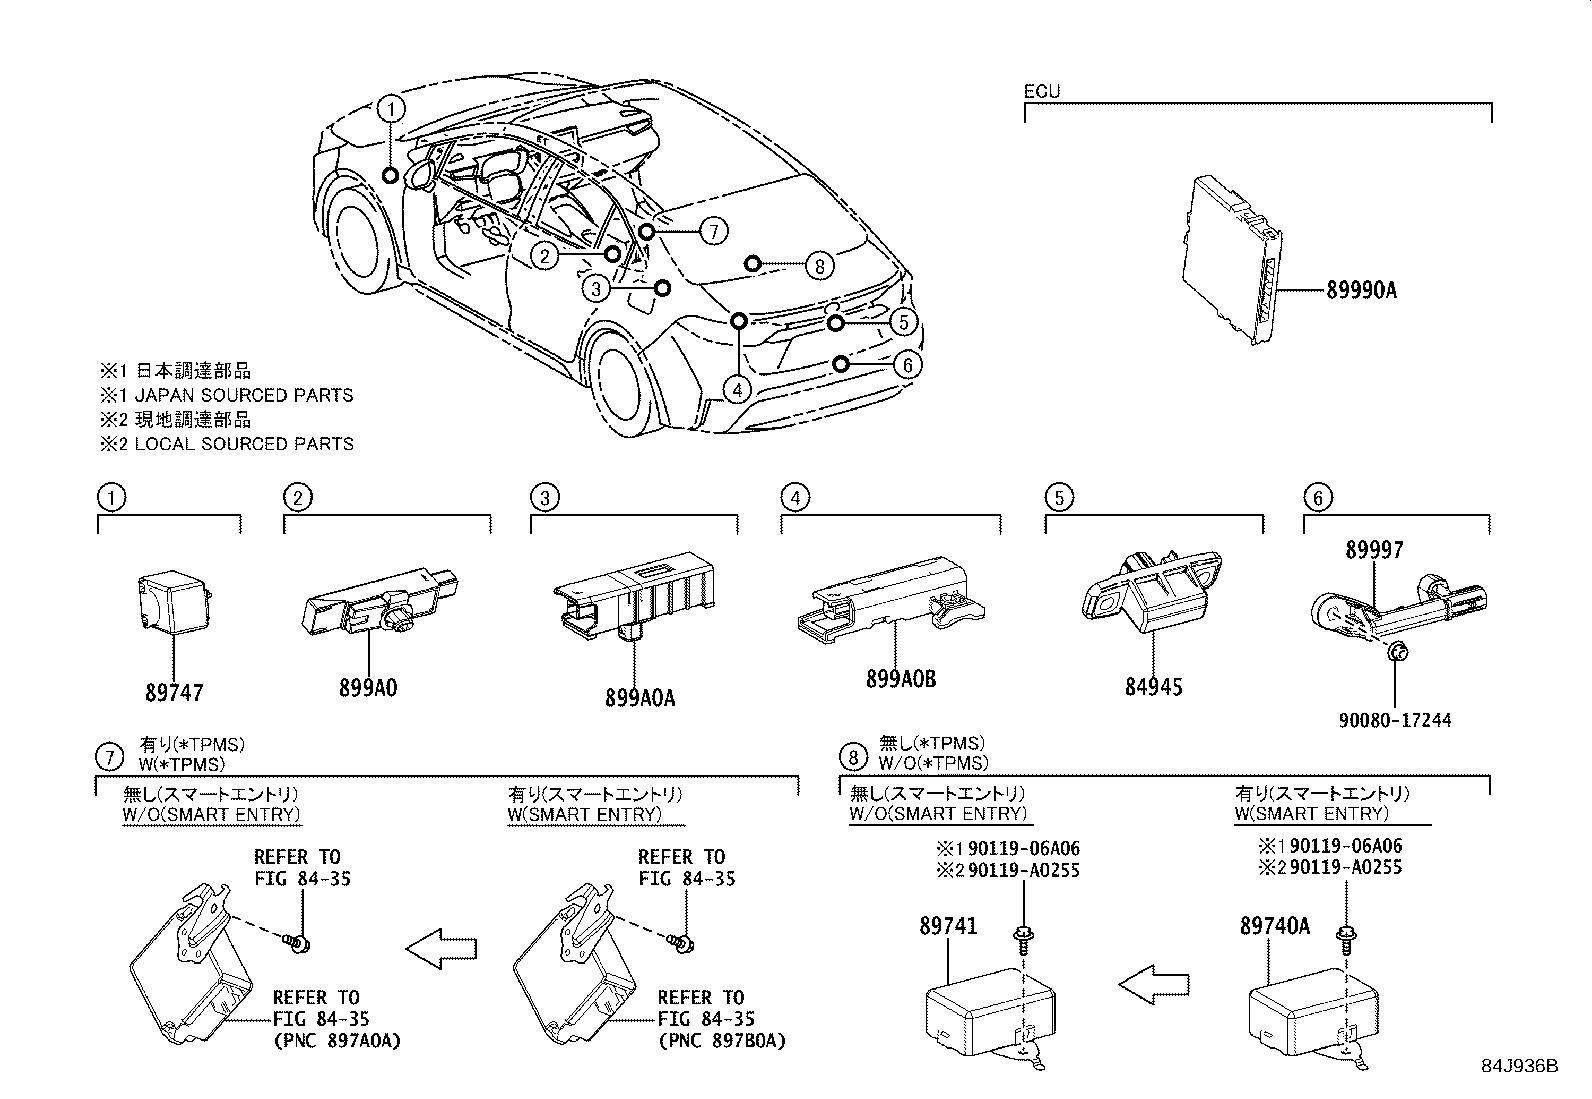 Toyota Corolla Anti-Theft Alarm Control Unit. Computer